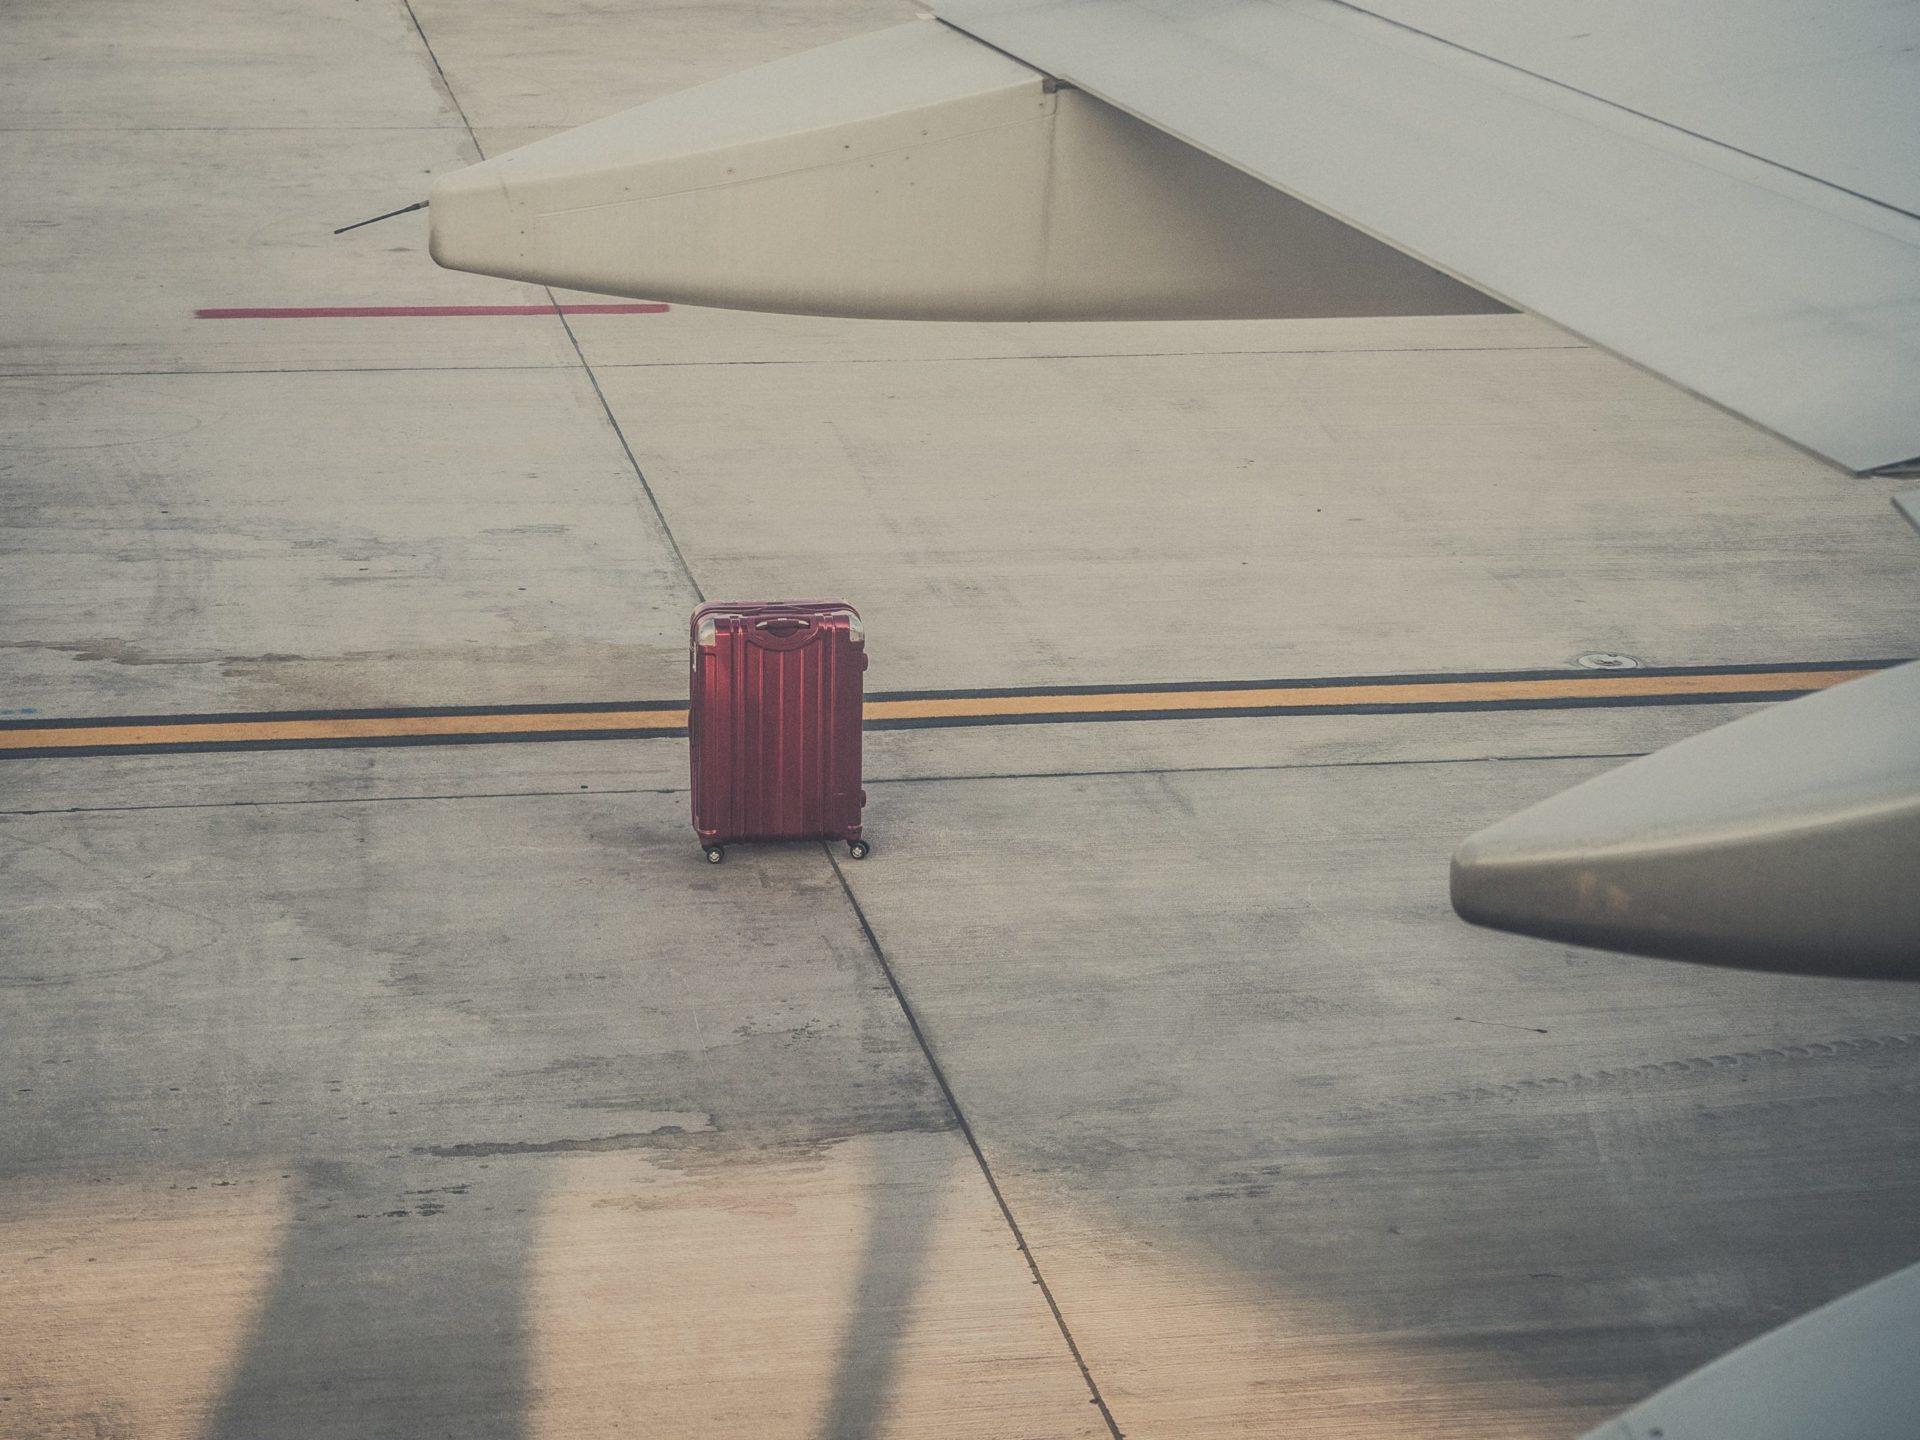 perte ou vol baggages